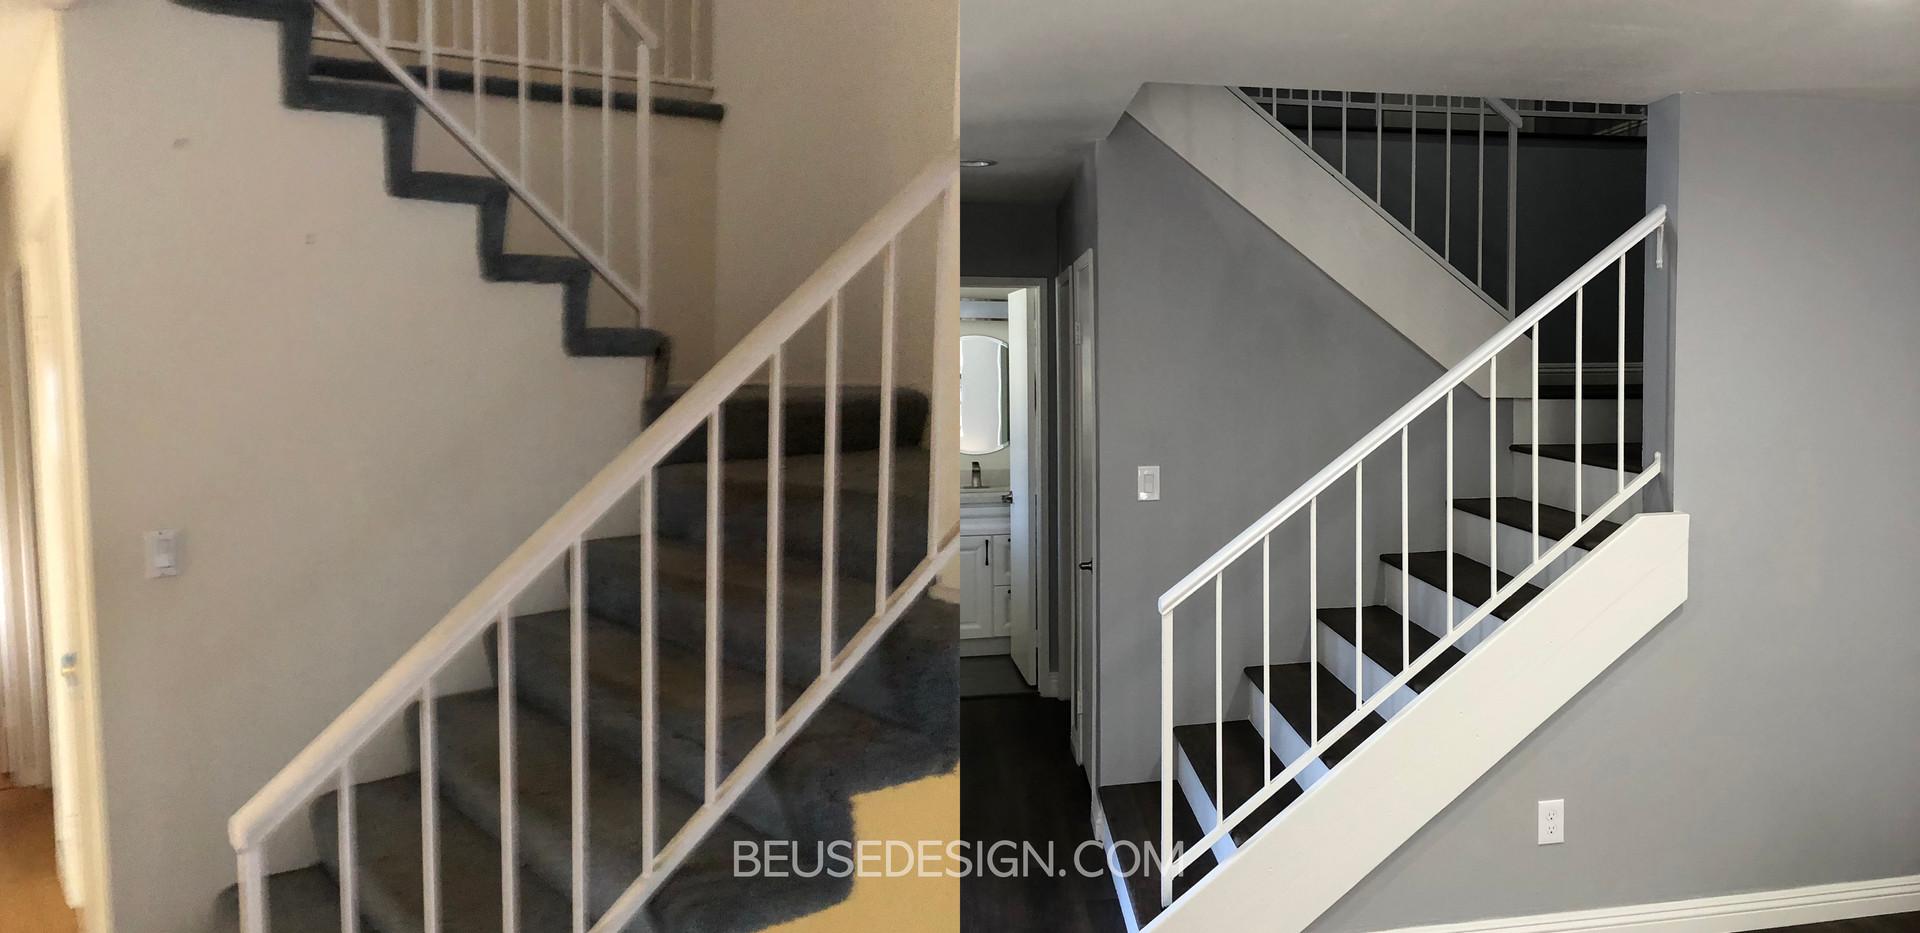 BA_Stair0120.jpg